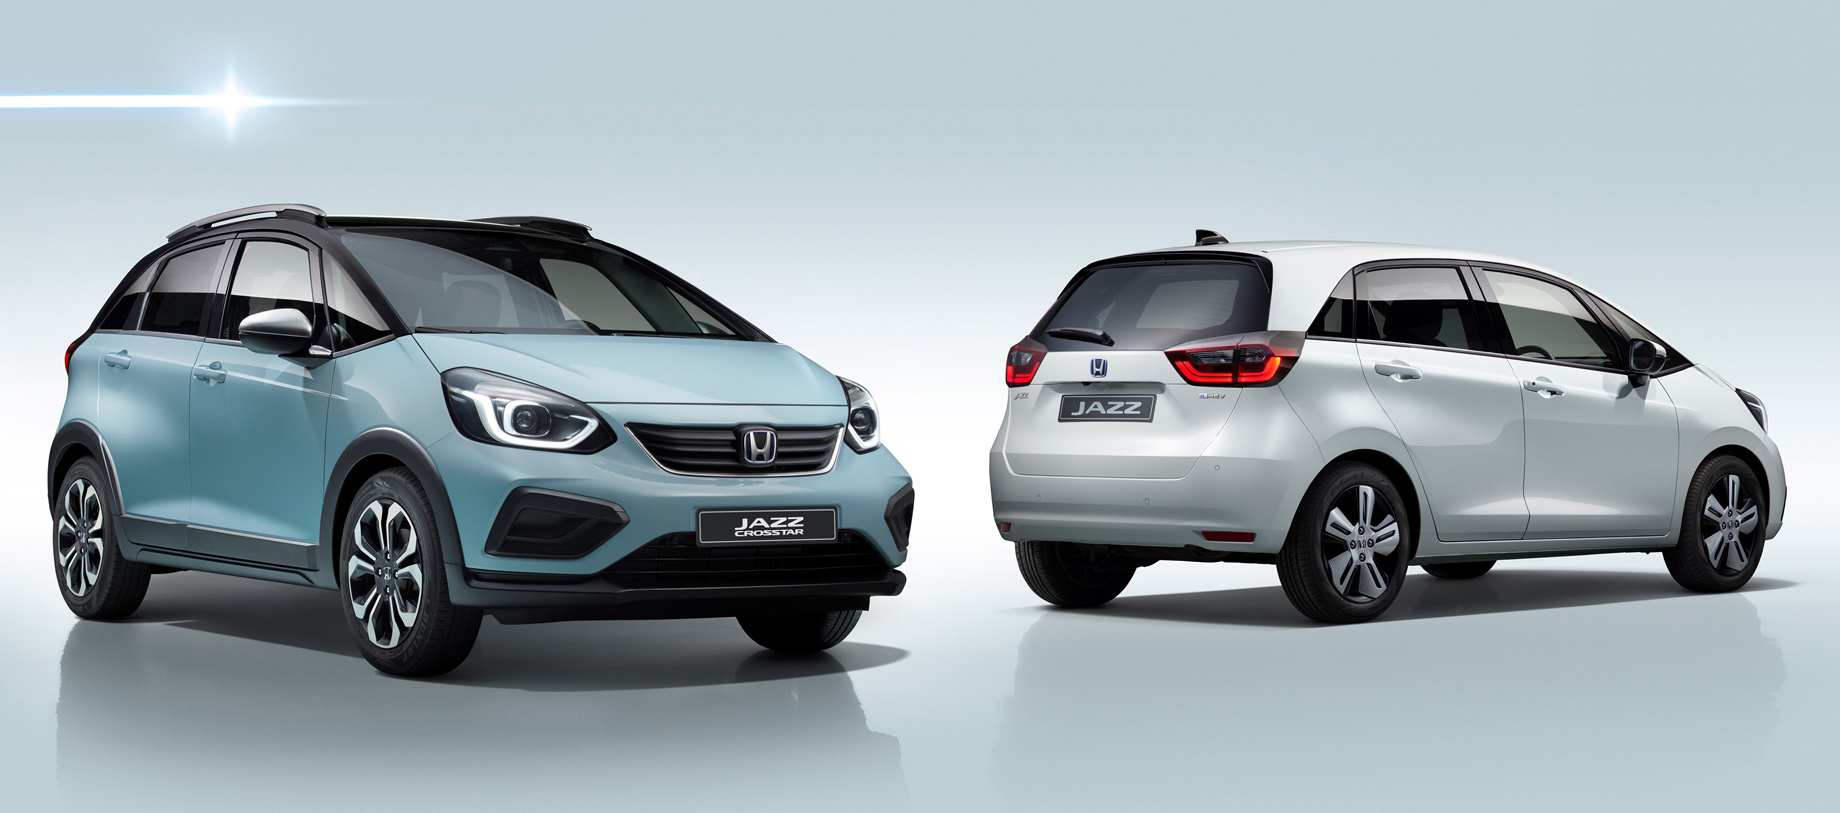 Европейская Honda Jazz предъявила характеристики